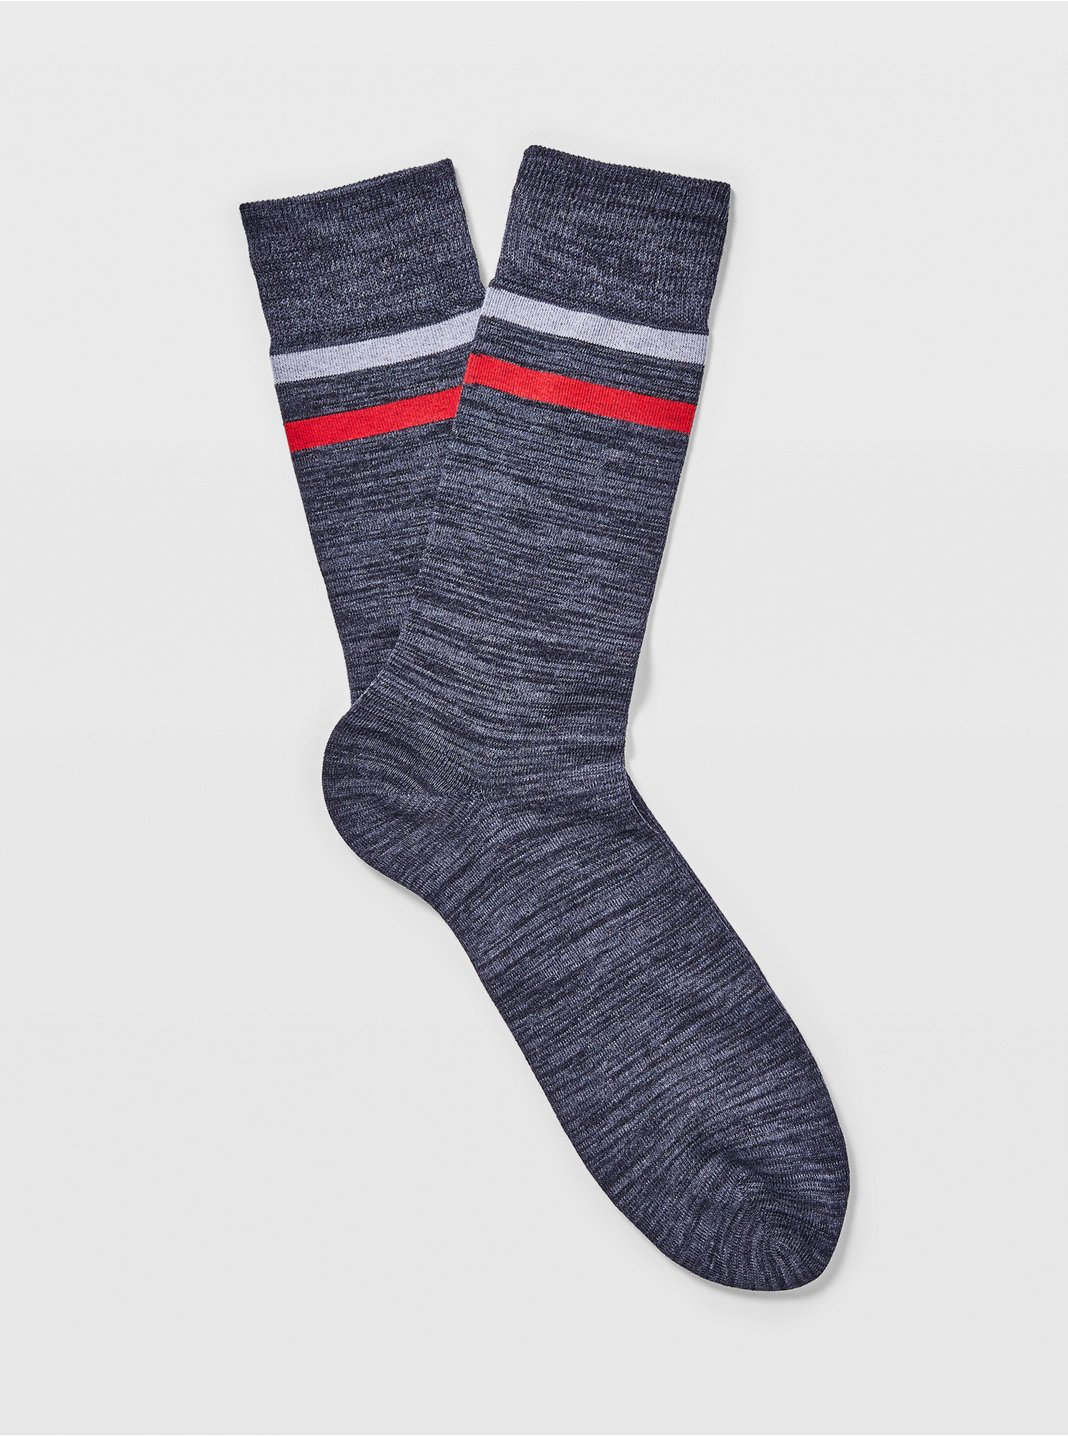 Spacedyed Two-Stripe Socks